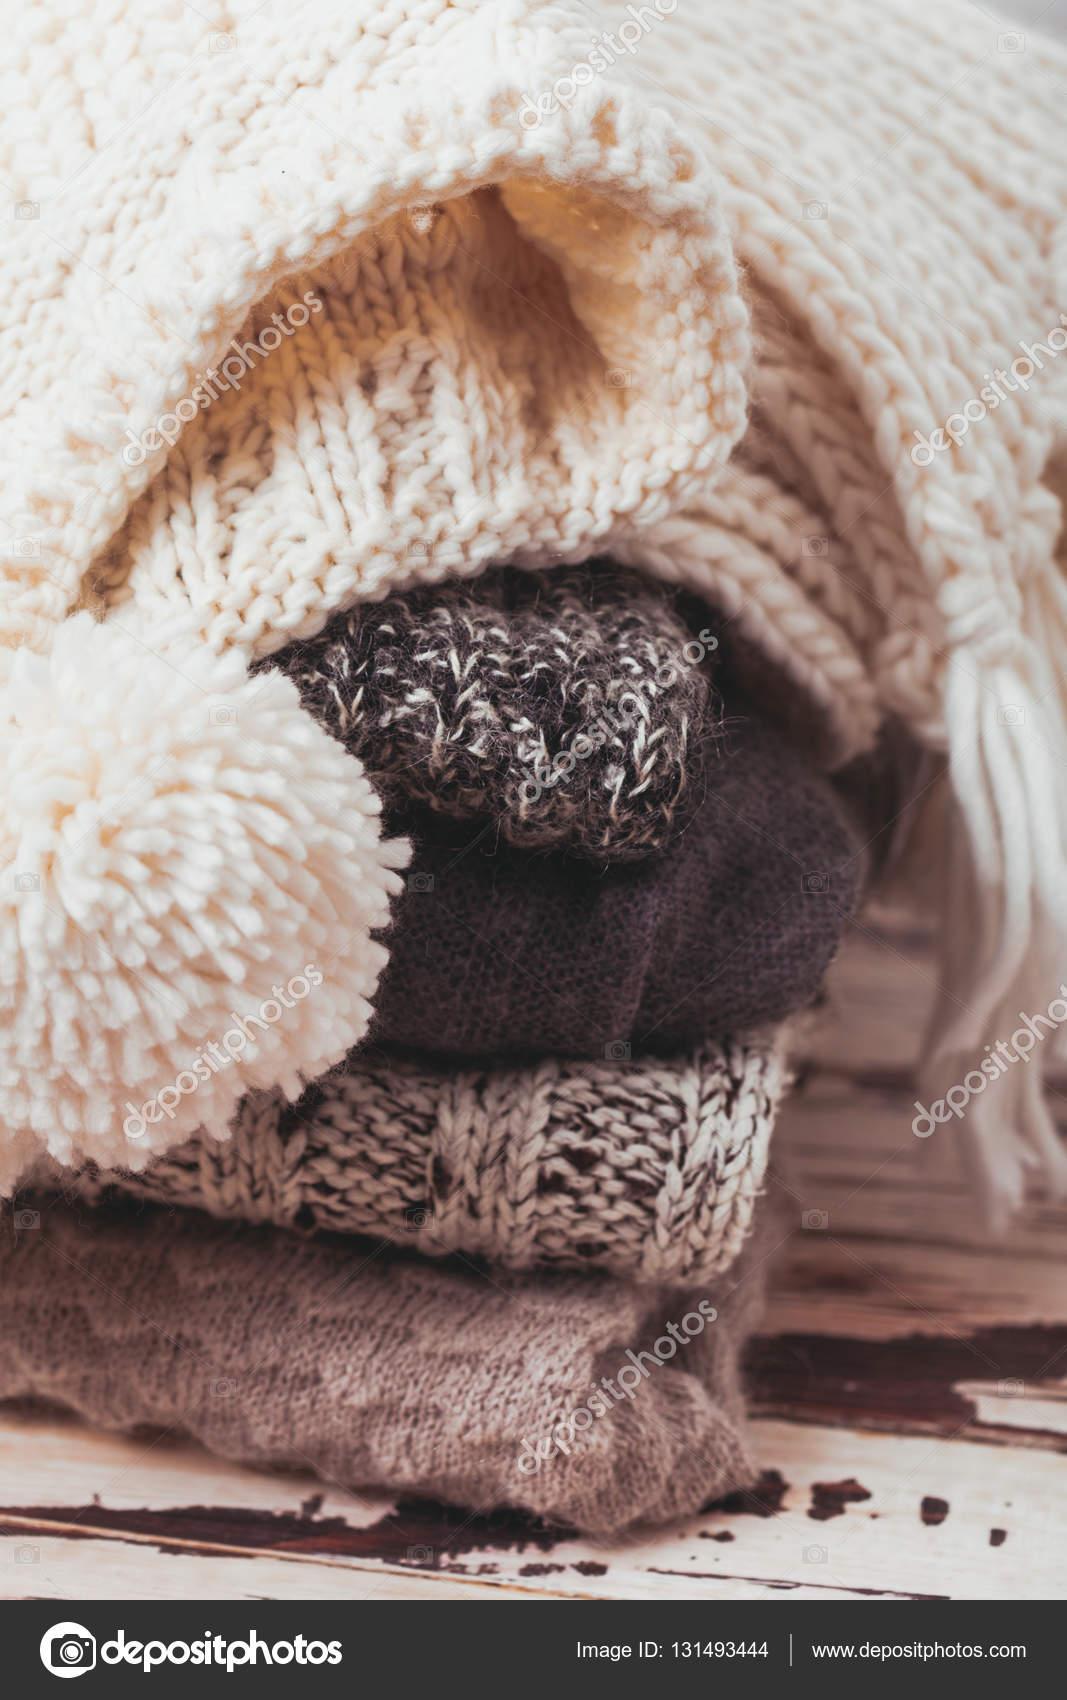 36fa76ebdf35 Συλλογή από μάλλινα ρούχα — Φωτογραφία Αρχείου · Στοίβα θερμό πλεκτά  πουλόβερ